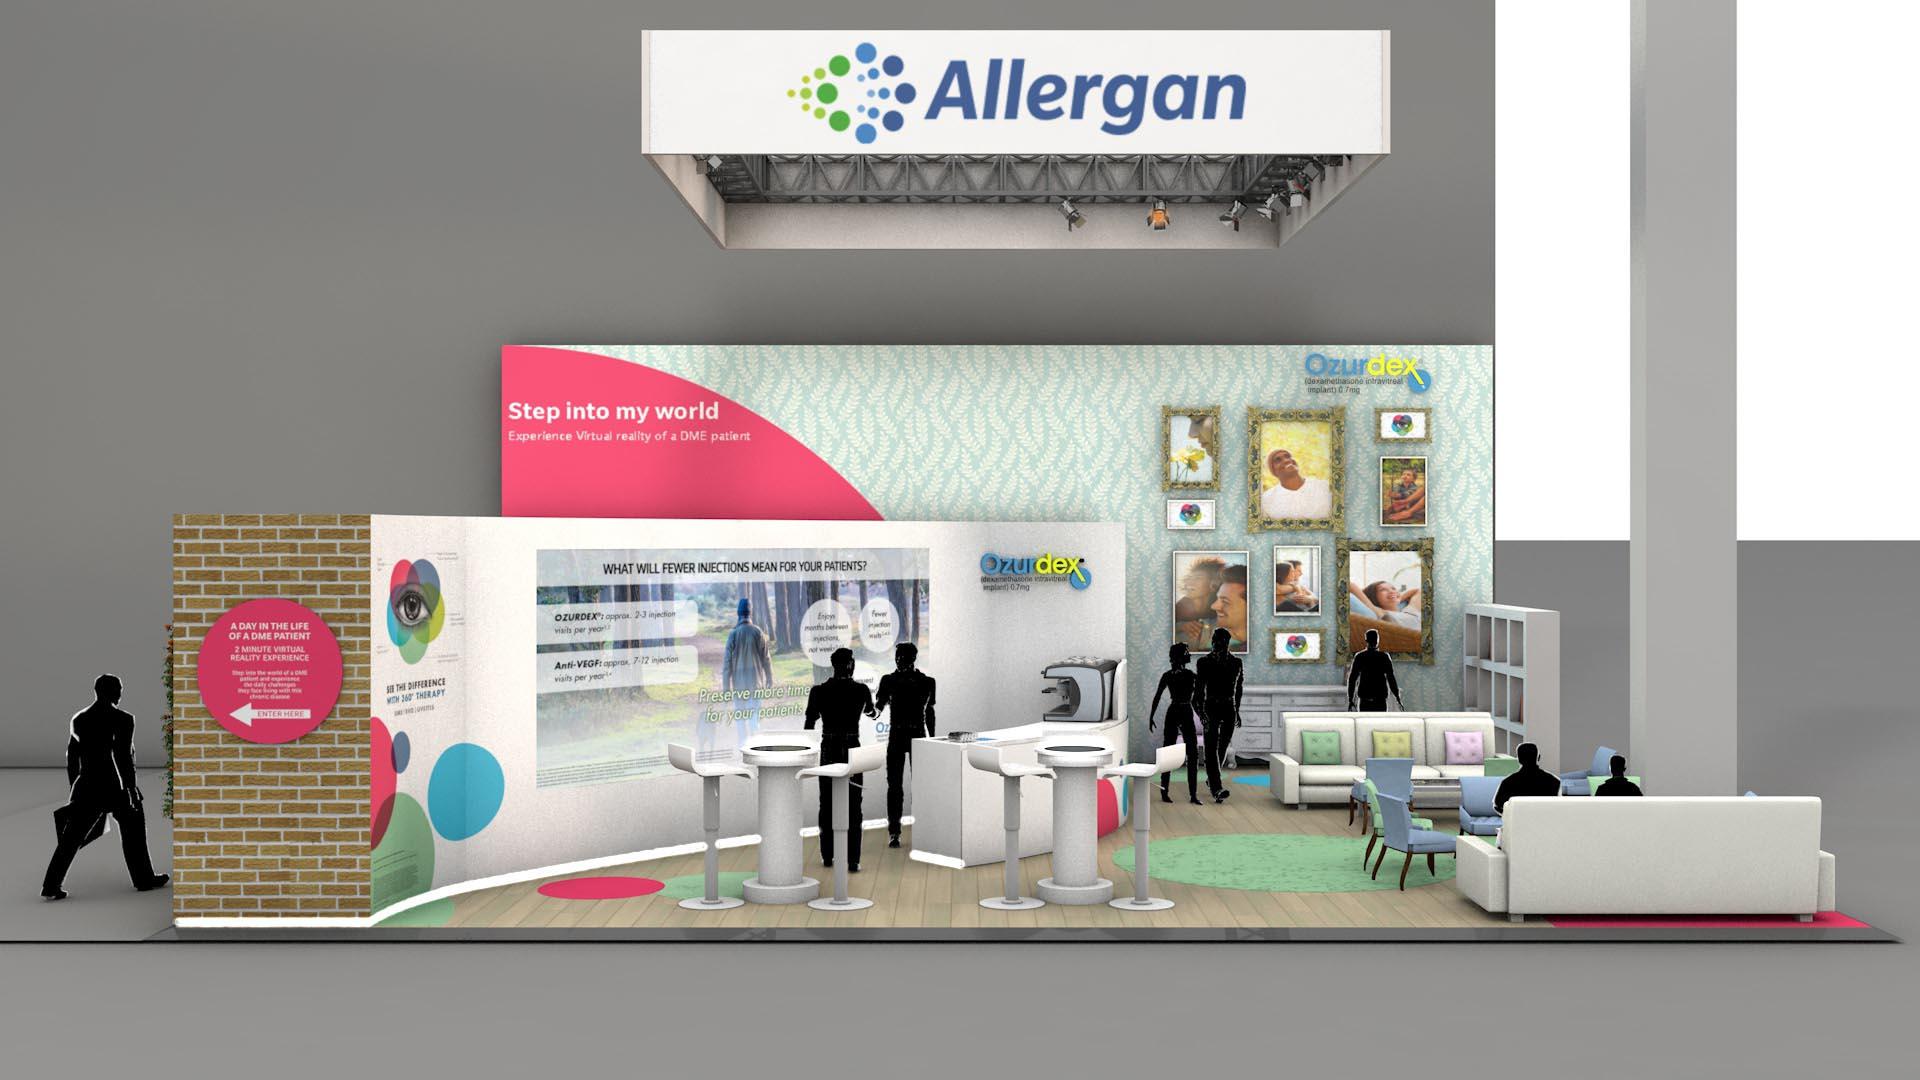 Exhibition Stand Design Allergan Medical Pharma